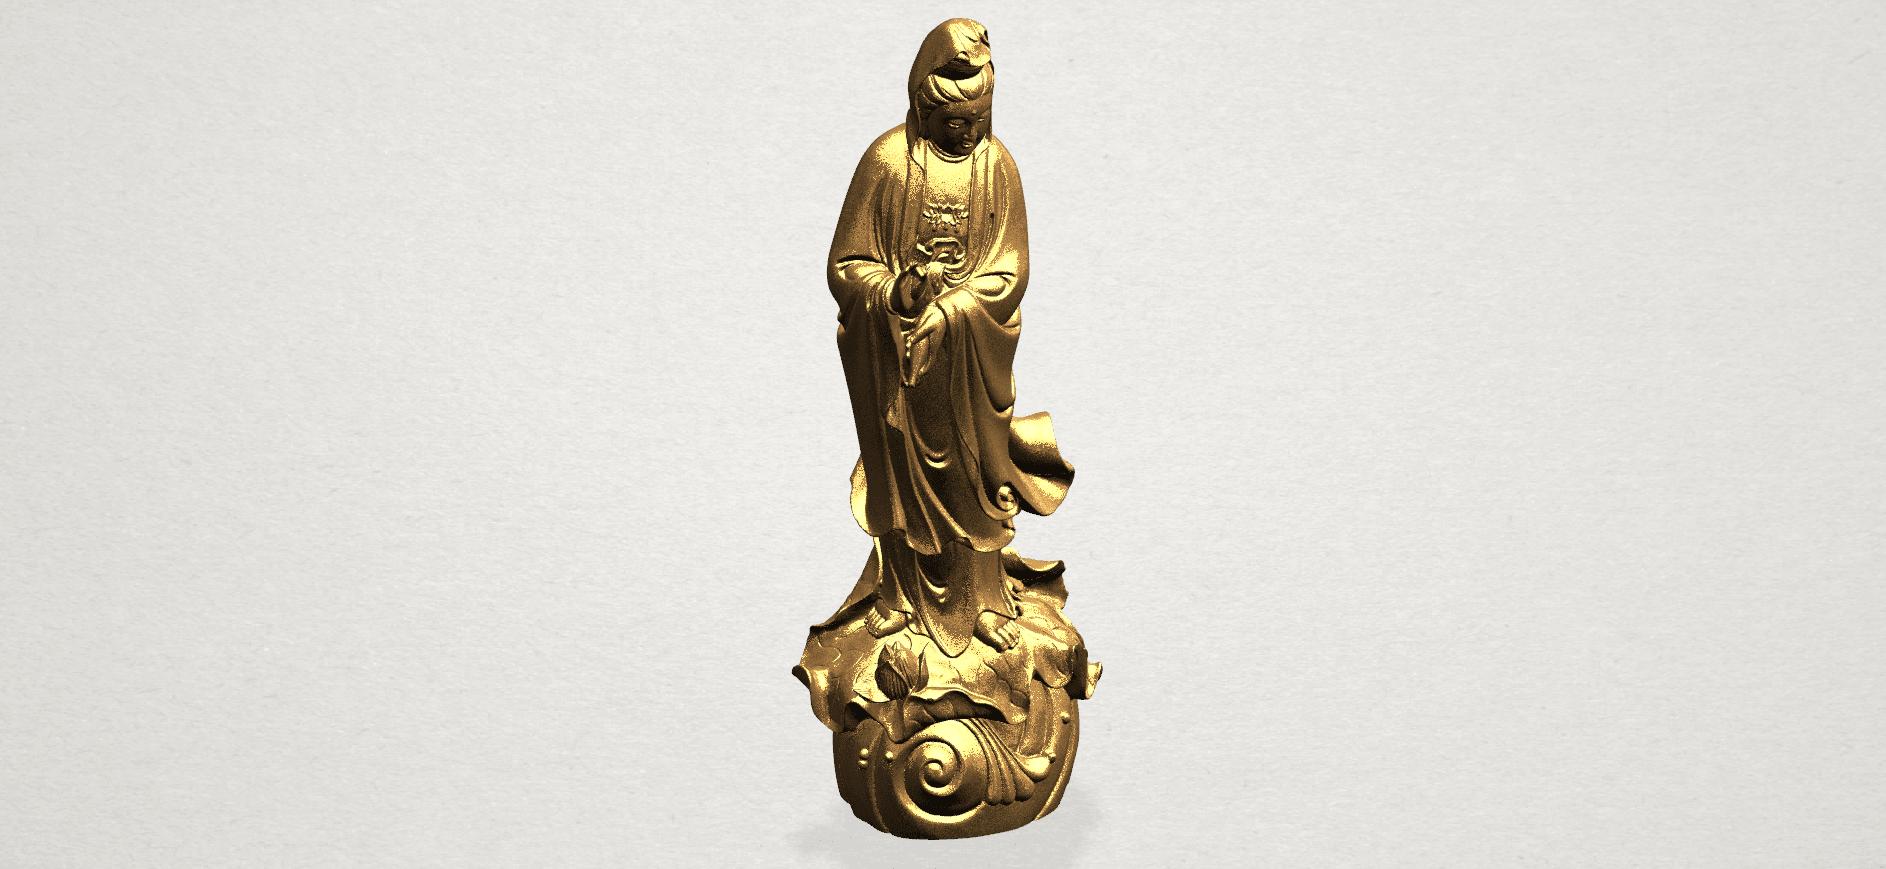 Avalokitesvara Buddha - Standing (i) A09.png Télécharger fichier STL gratuit Avalokitesvara Bodhisattva - Debout 01 • Design à imprimer en 3D, GeorgesNikkei